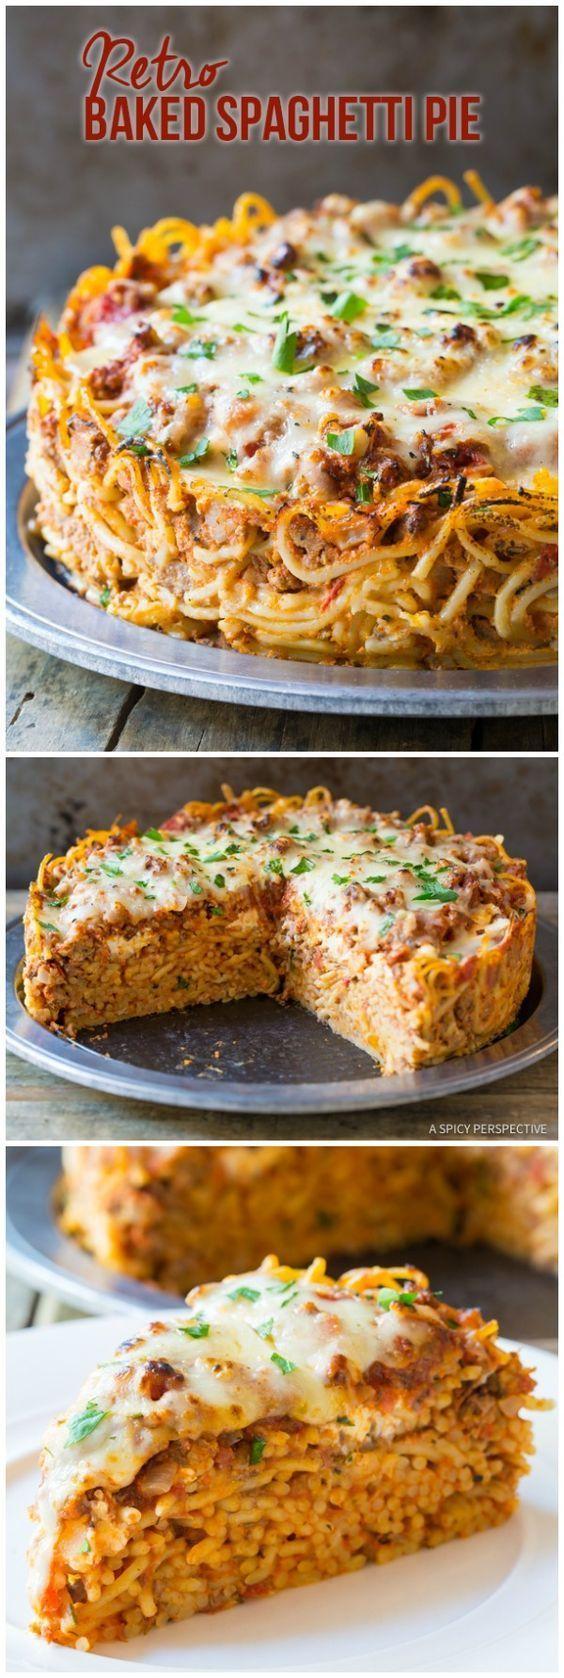 Baked Spaghetti Pie Recipe Recipe